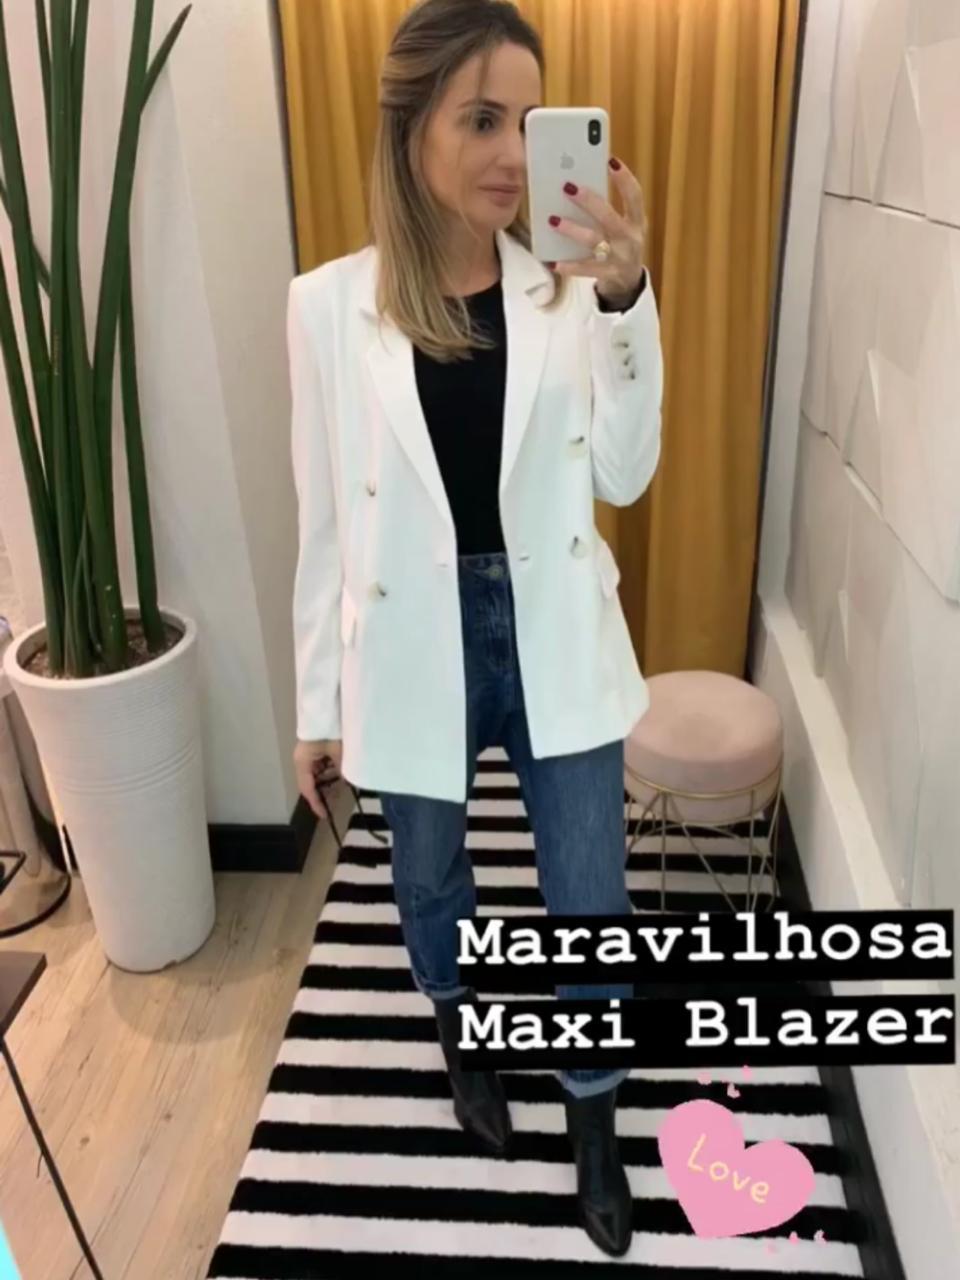 Maxi Blazer Serafina Cores   Off, AzuL, Coral, Preto, Rosa, Marinho, Azul Claro